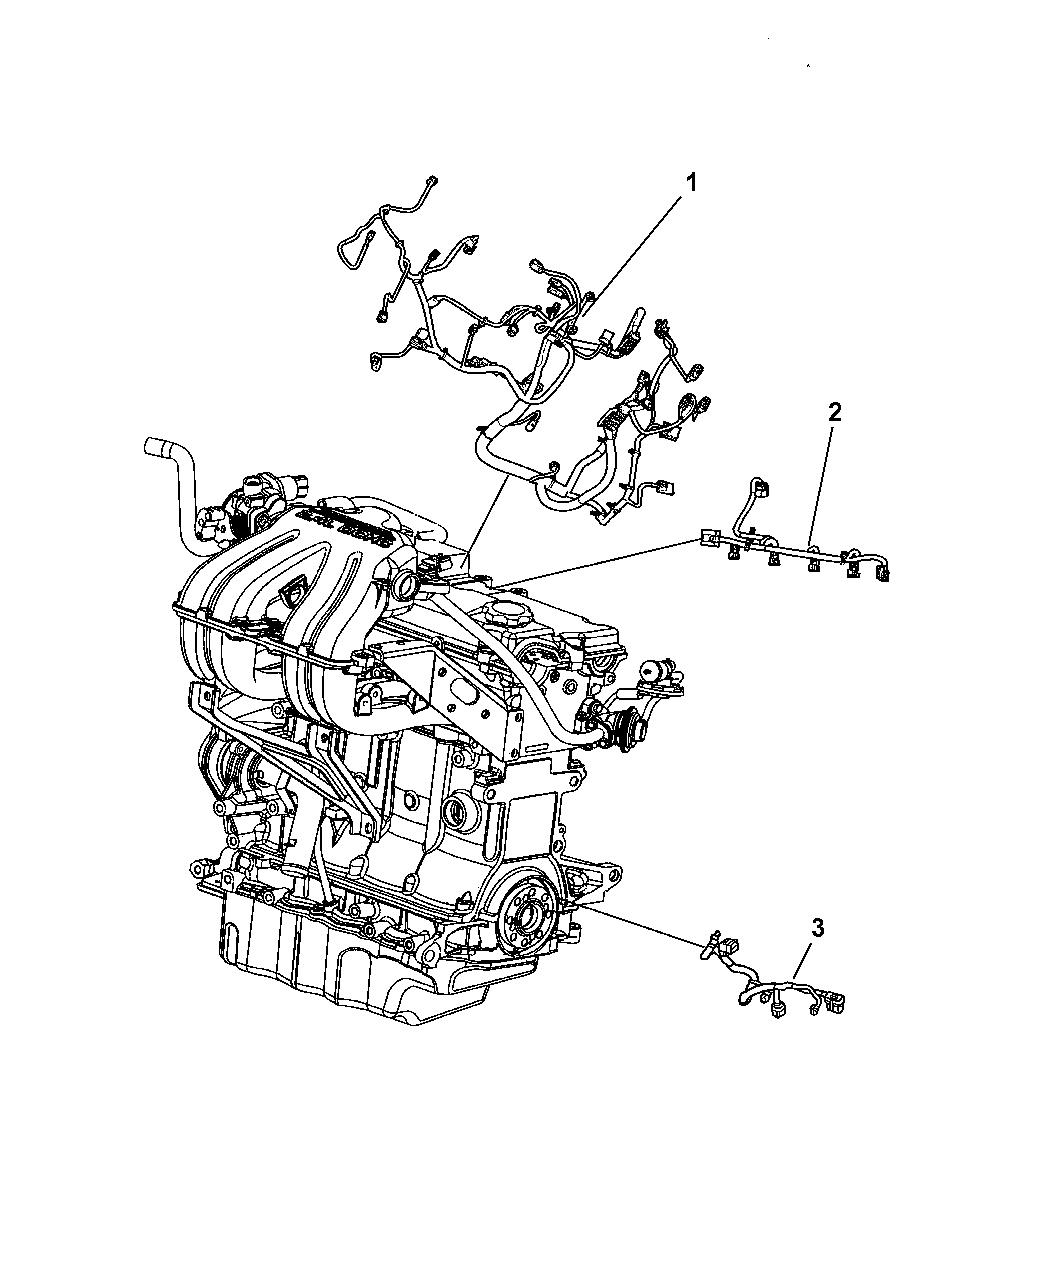 Wiring Diagram Creator: 2004 DODGE CARAVAN ENGINE HOSE DIAGRAM